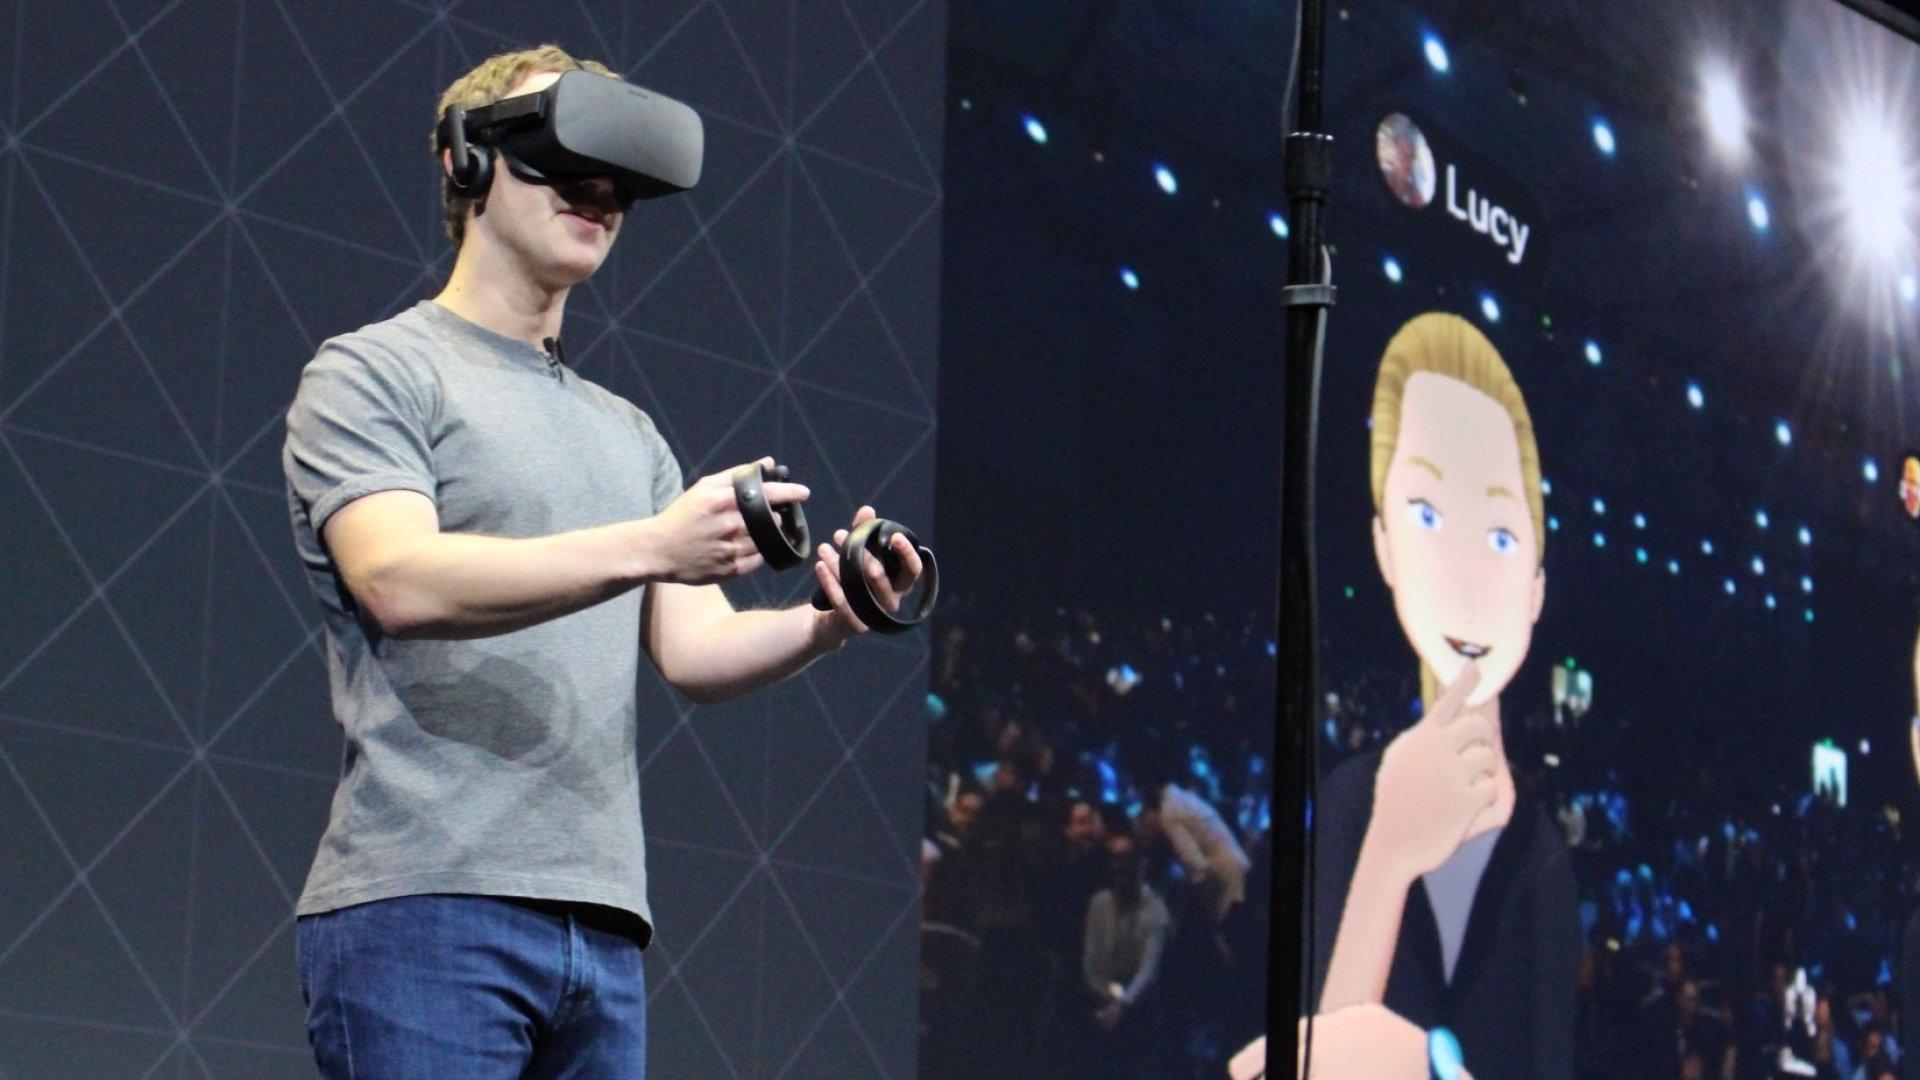 Facebook Employees Show Mark Zuckerberg New Product Ideas